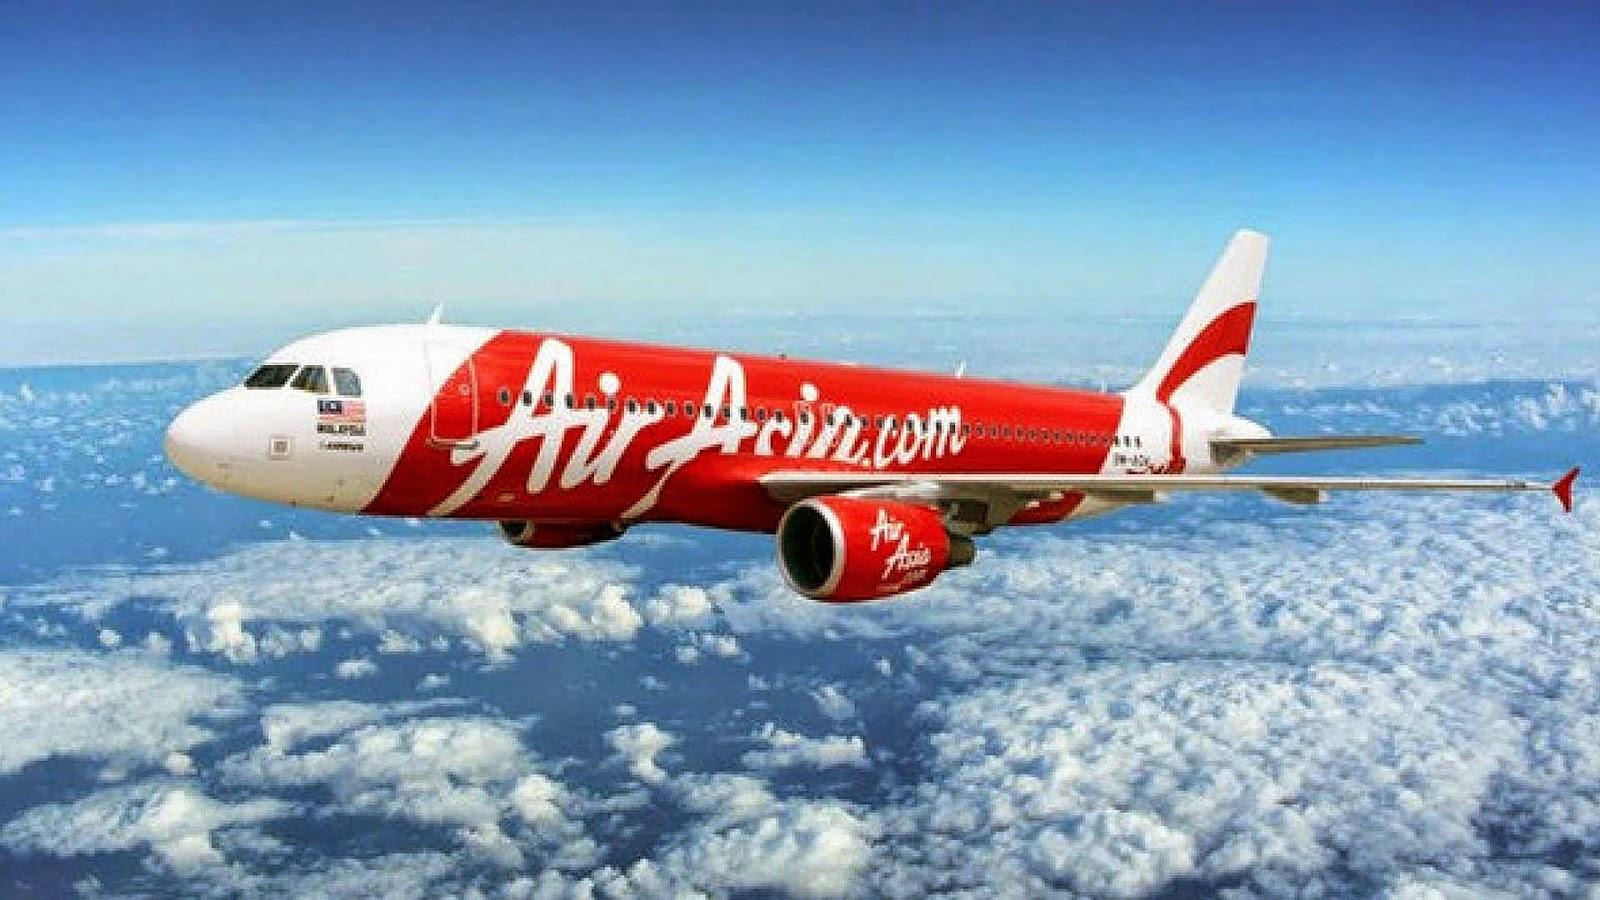 Pesawat Terbang AirAsia QZ 8501